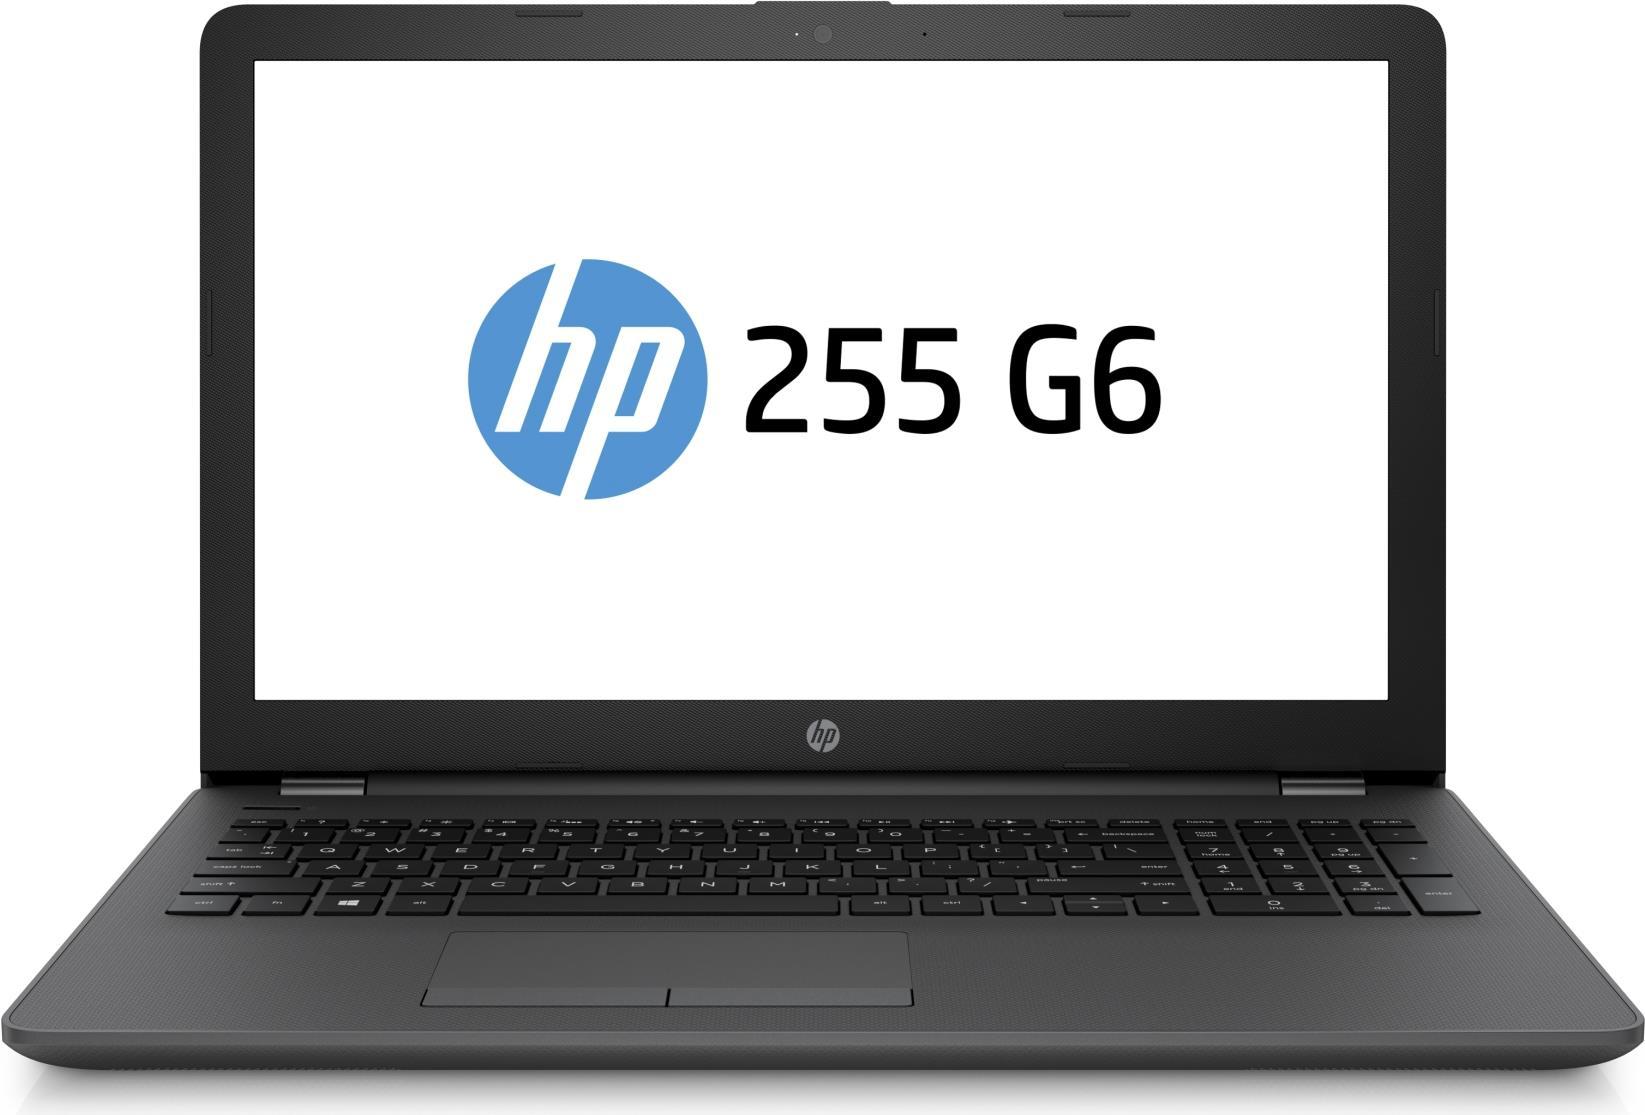 Notebooks, Laptops - HP Notebook 255 G6 2VP34ES HD E2 FreeDOS 39 cm (15.6') Radeon R2 AMD Turbo Core Technologie 4 GB (2VP34ES)  - Onlineshop JACOB Elektronik